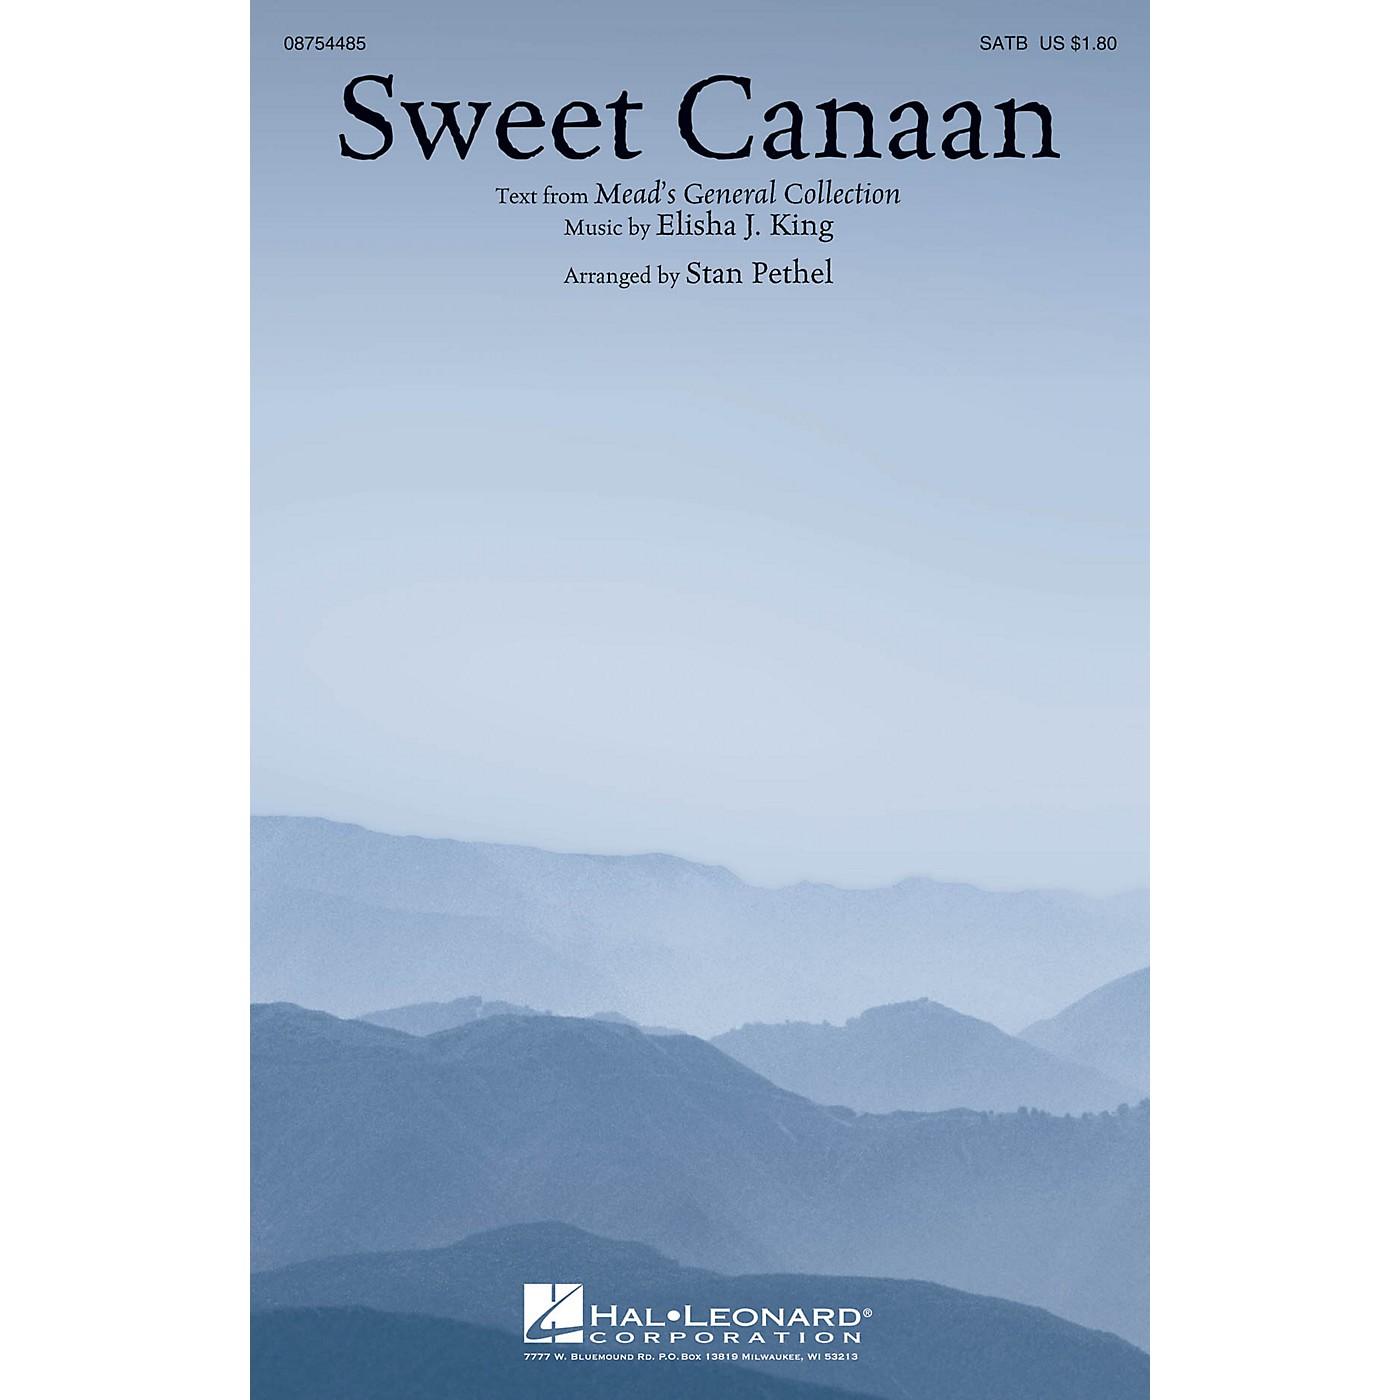 Hal Leonard Sweet Canaan SATB arranged by Stan Pethel thumbnail